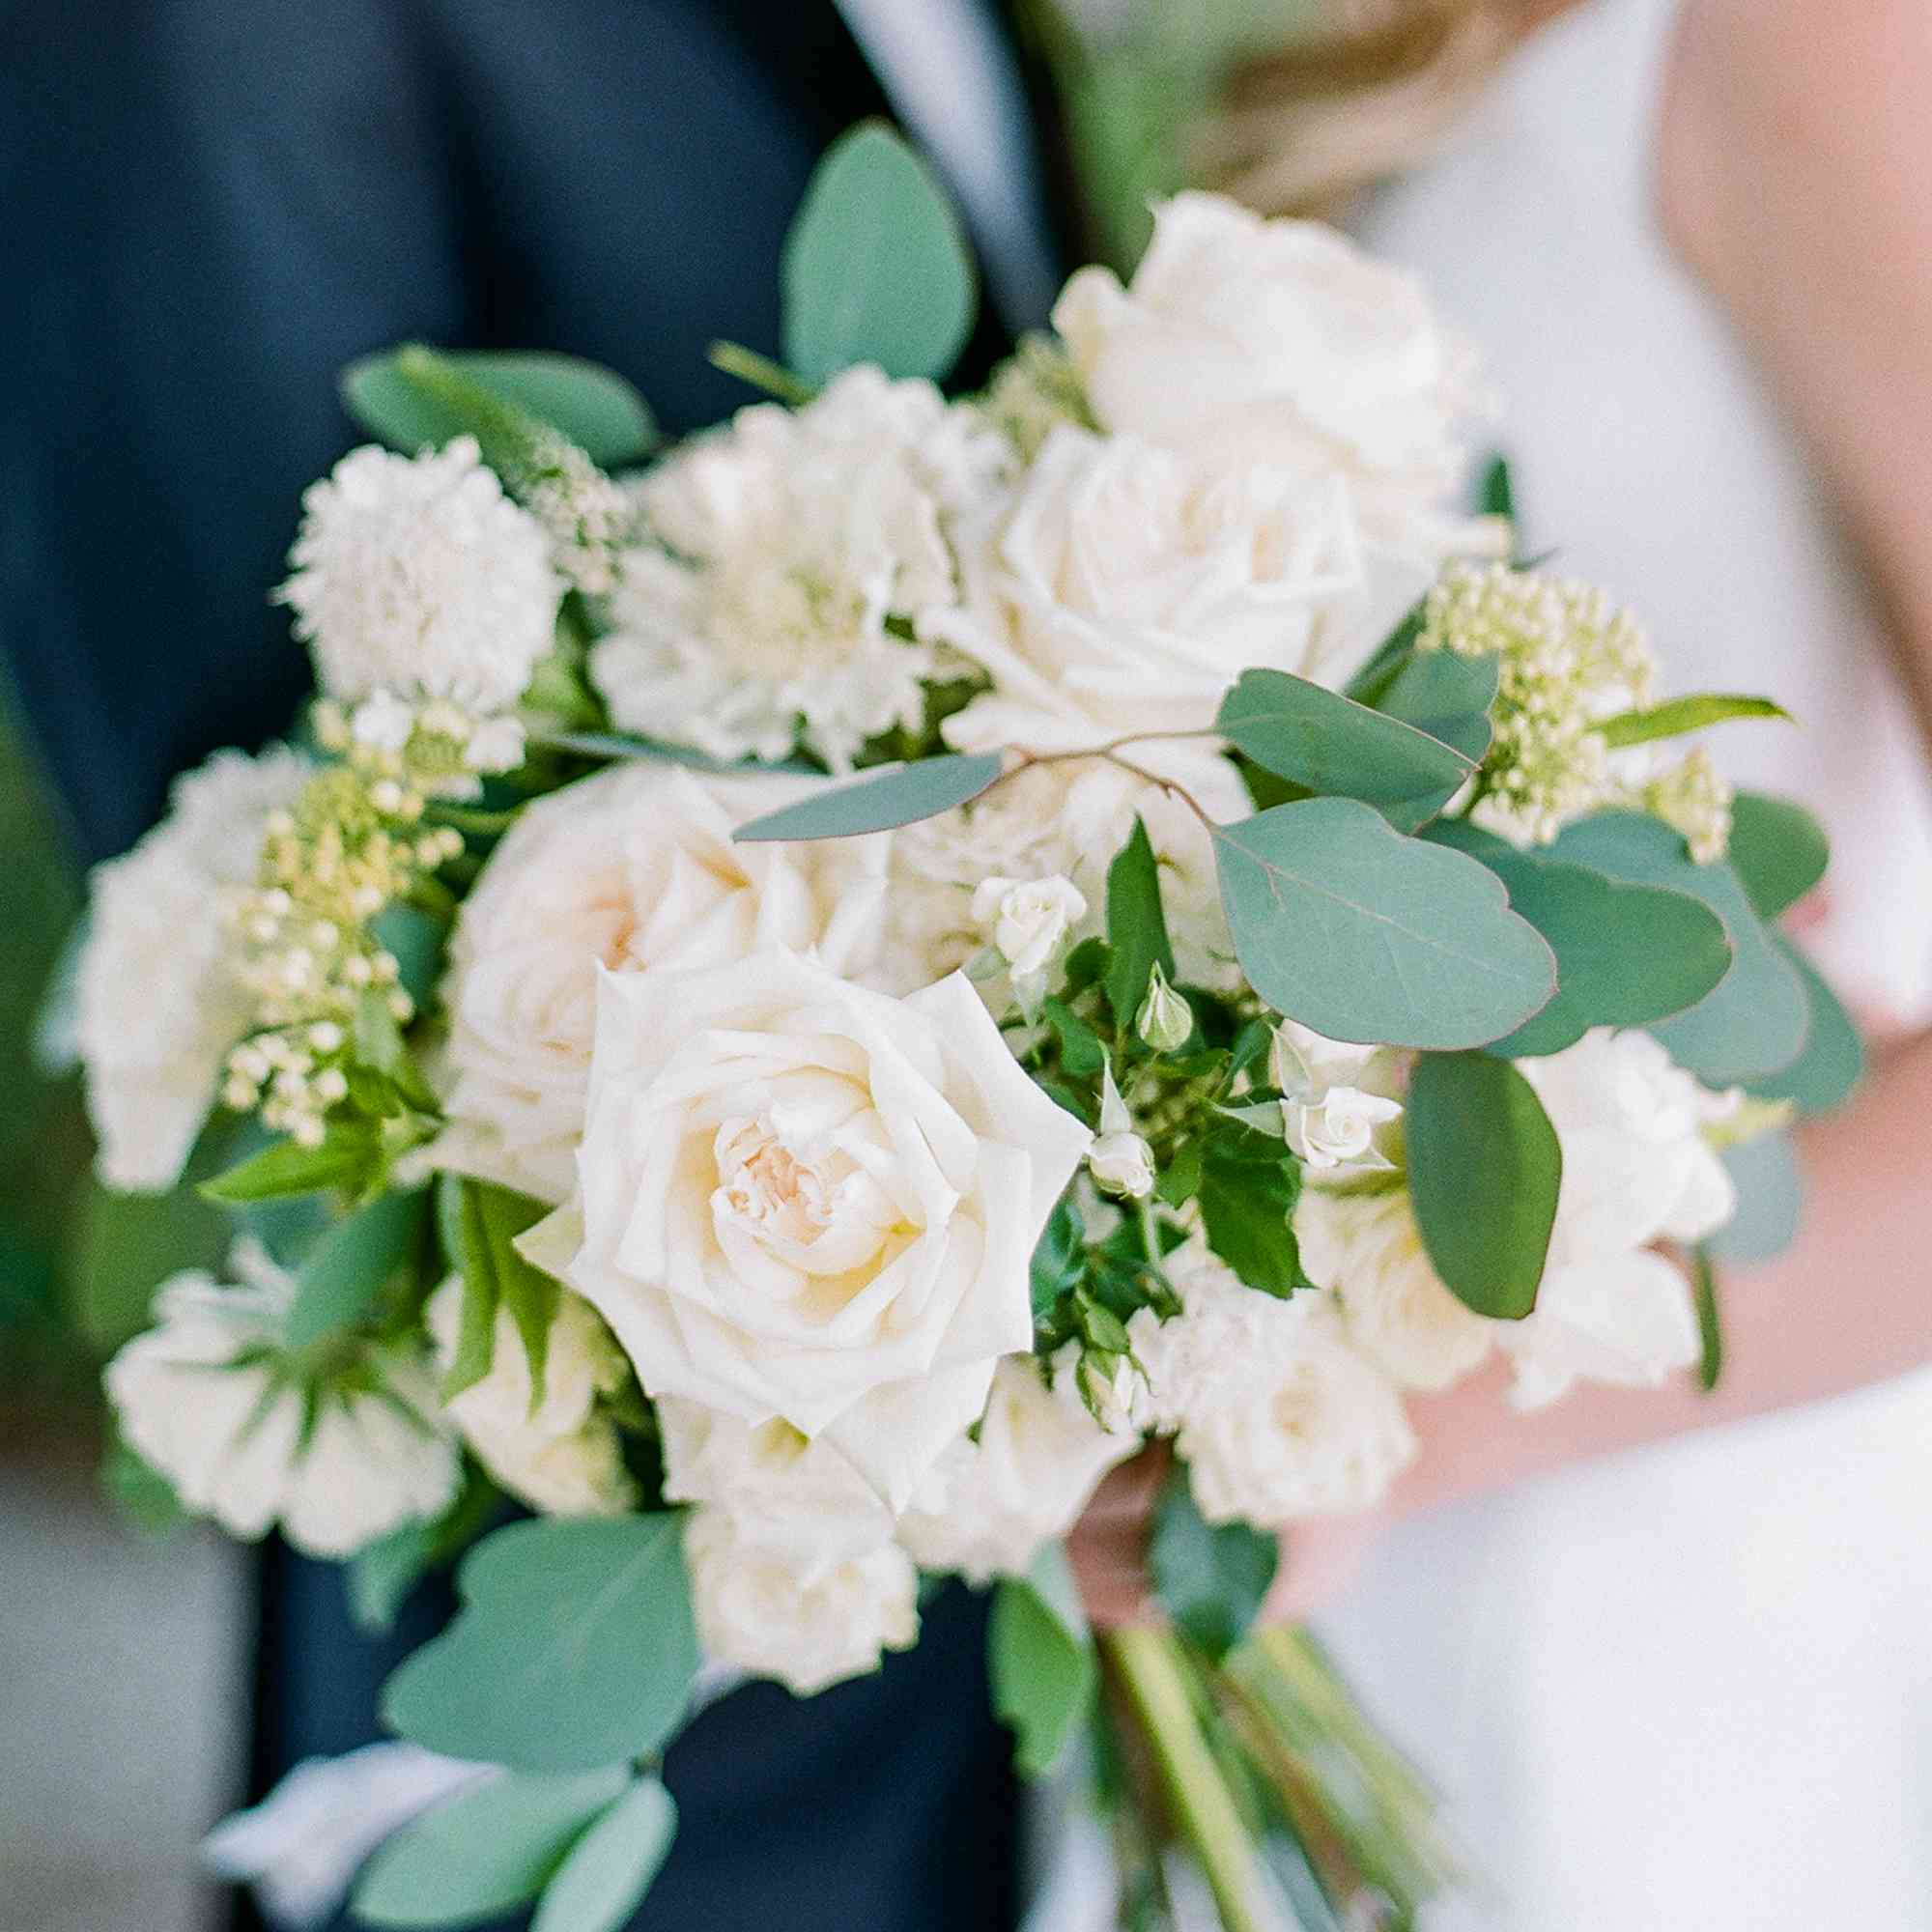 <p>Bride holding white rose bouquet</p><br><br>